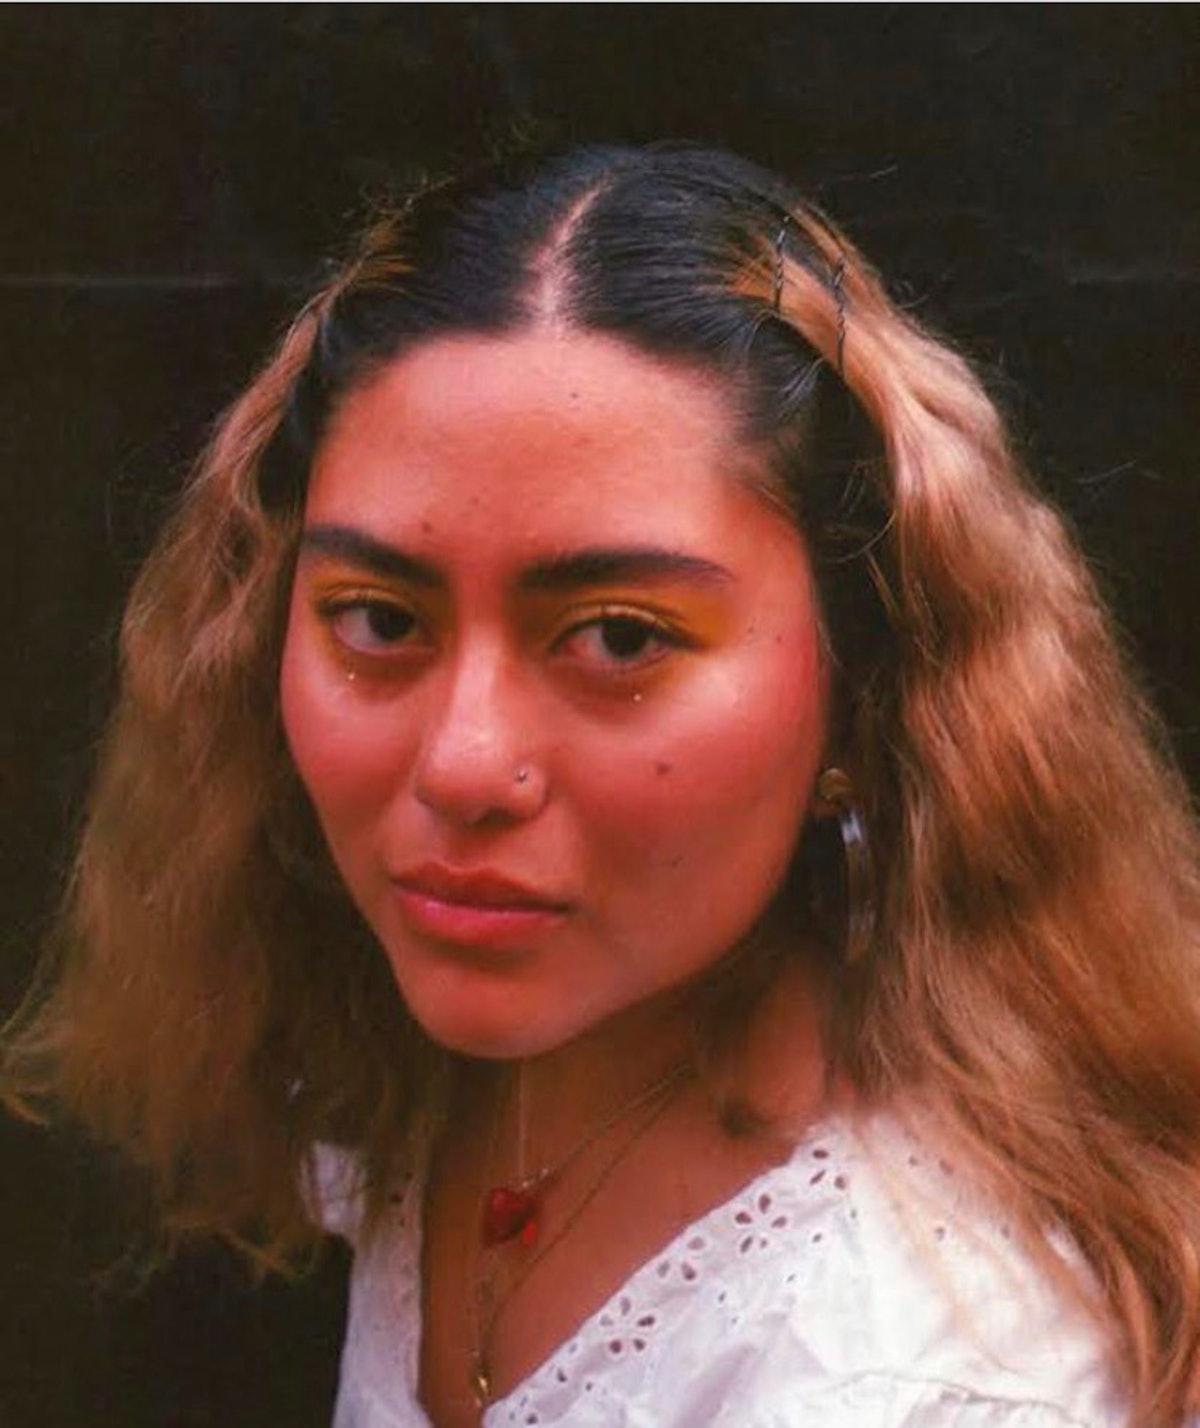 Nereida Ortiz, a DACA recipient, looks directly into the camera